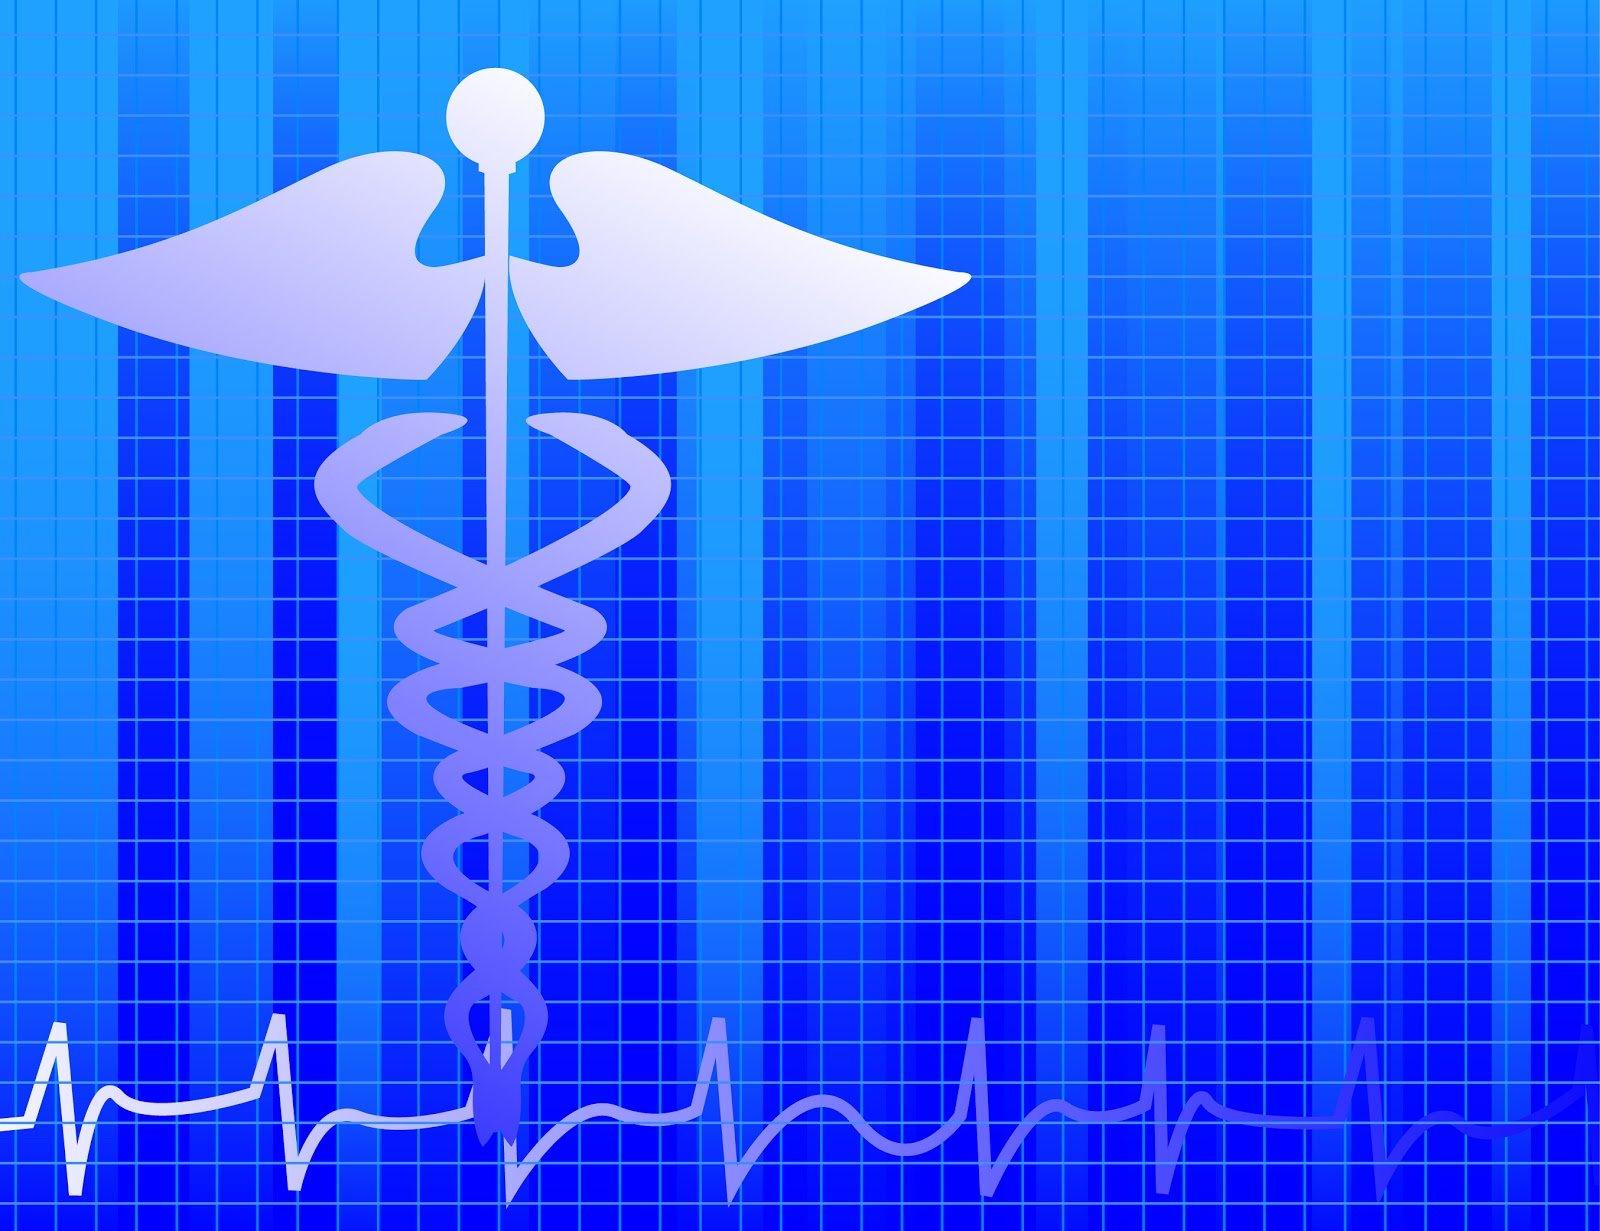 Картинки для слайда медицина